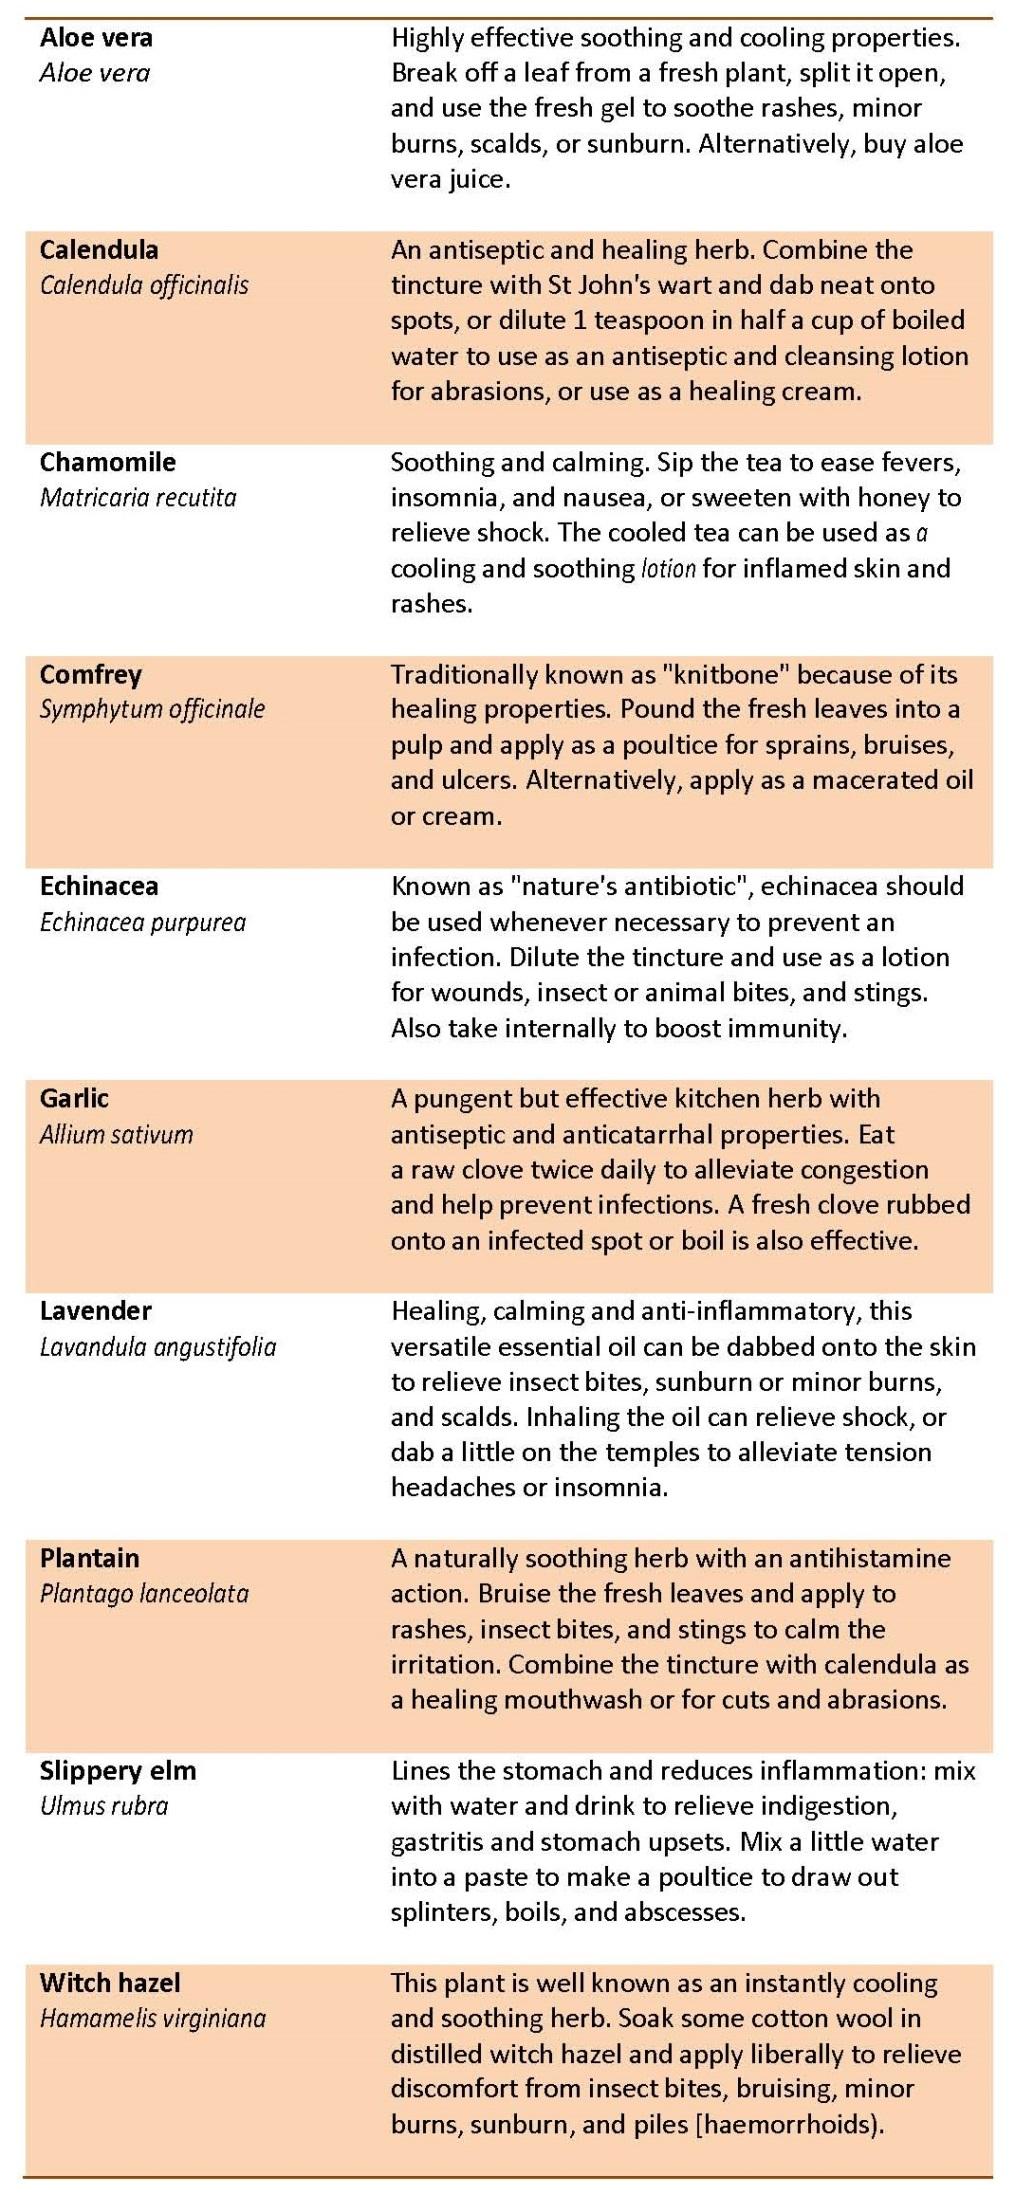 herbalfirstaid